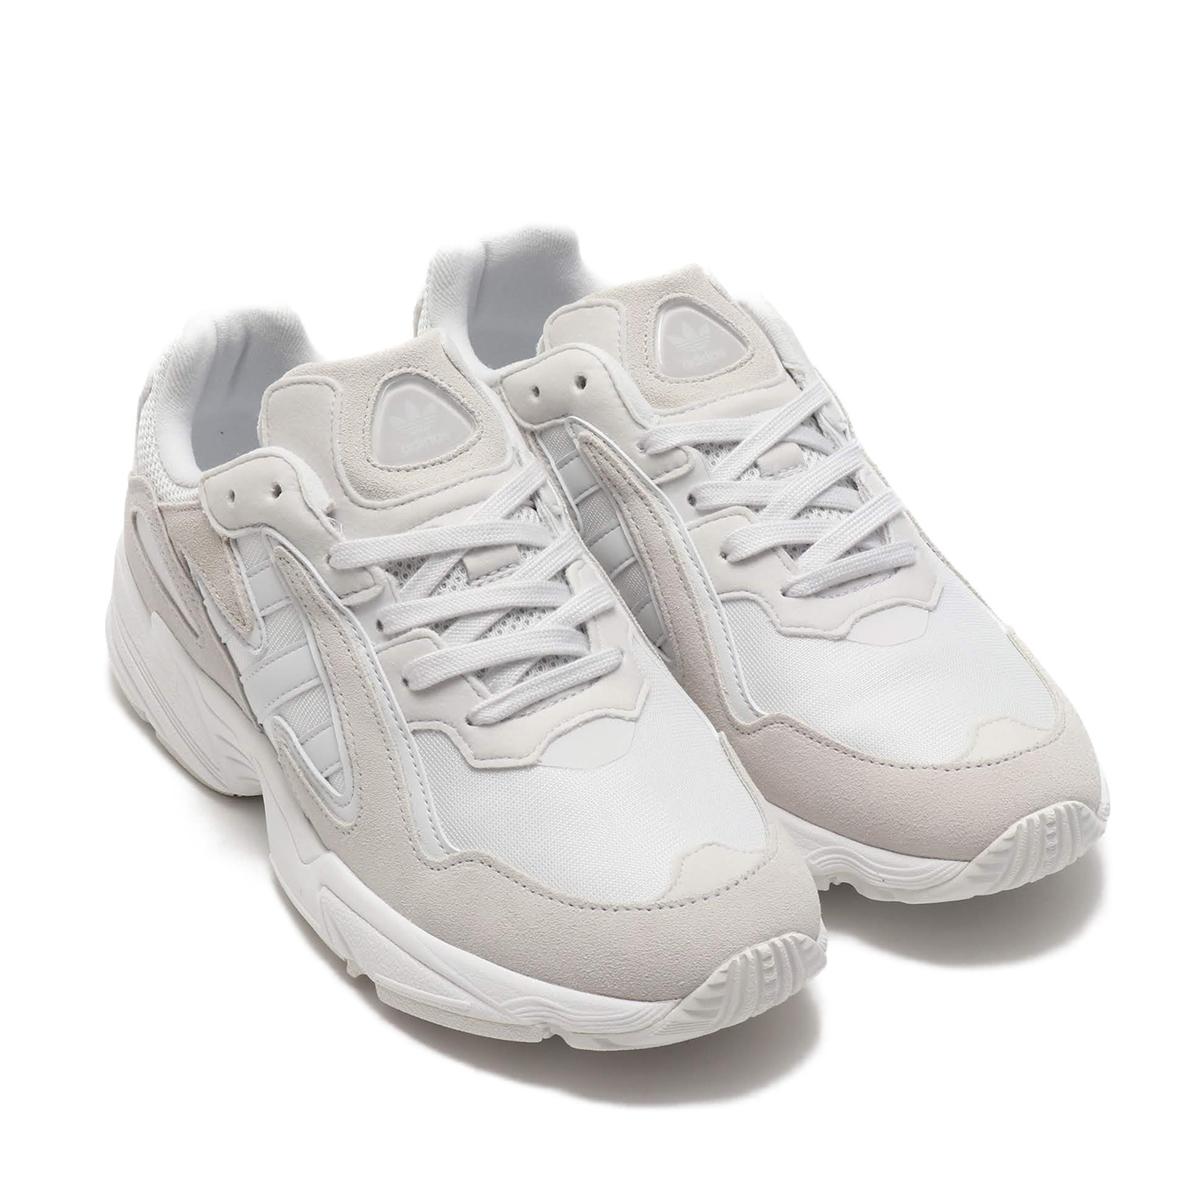 adidas Originals YUNG-96 CHASM(アディダスオリジナルス ヤングキューロク CHASM)CRYSTAL WHITE/CRYSTAL WHITE/RUNNING WHITE【メンズ レディース スニーカー】19FW-S